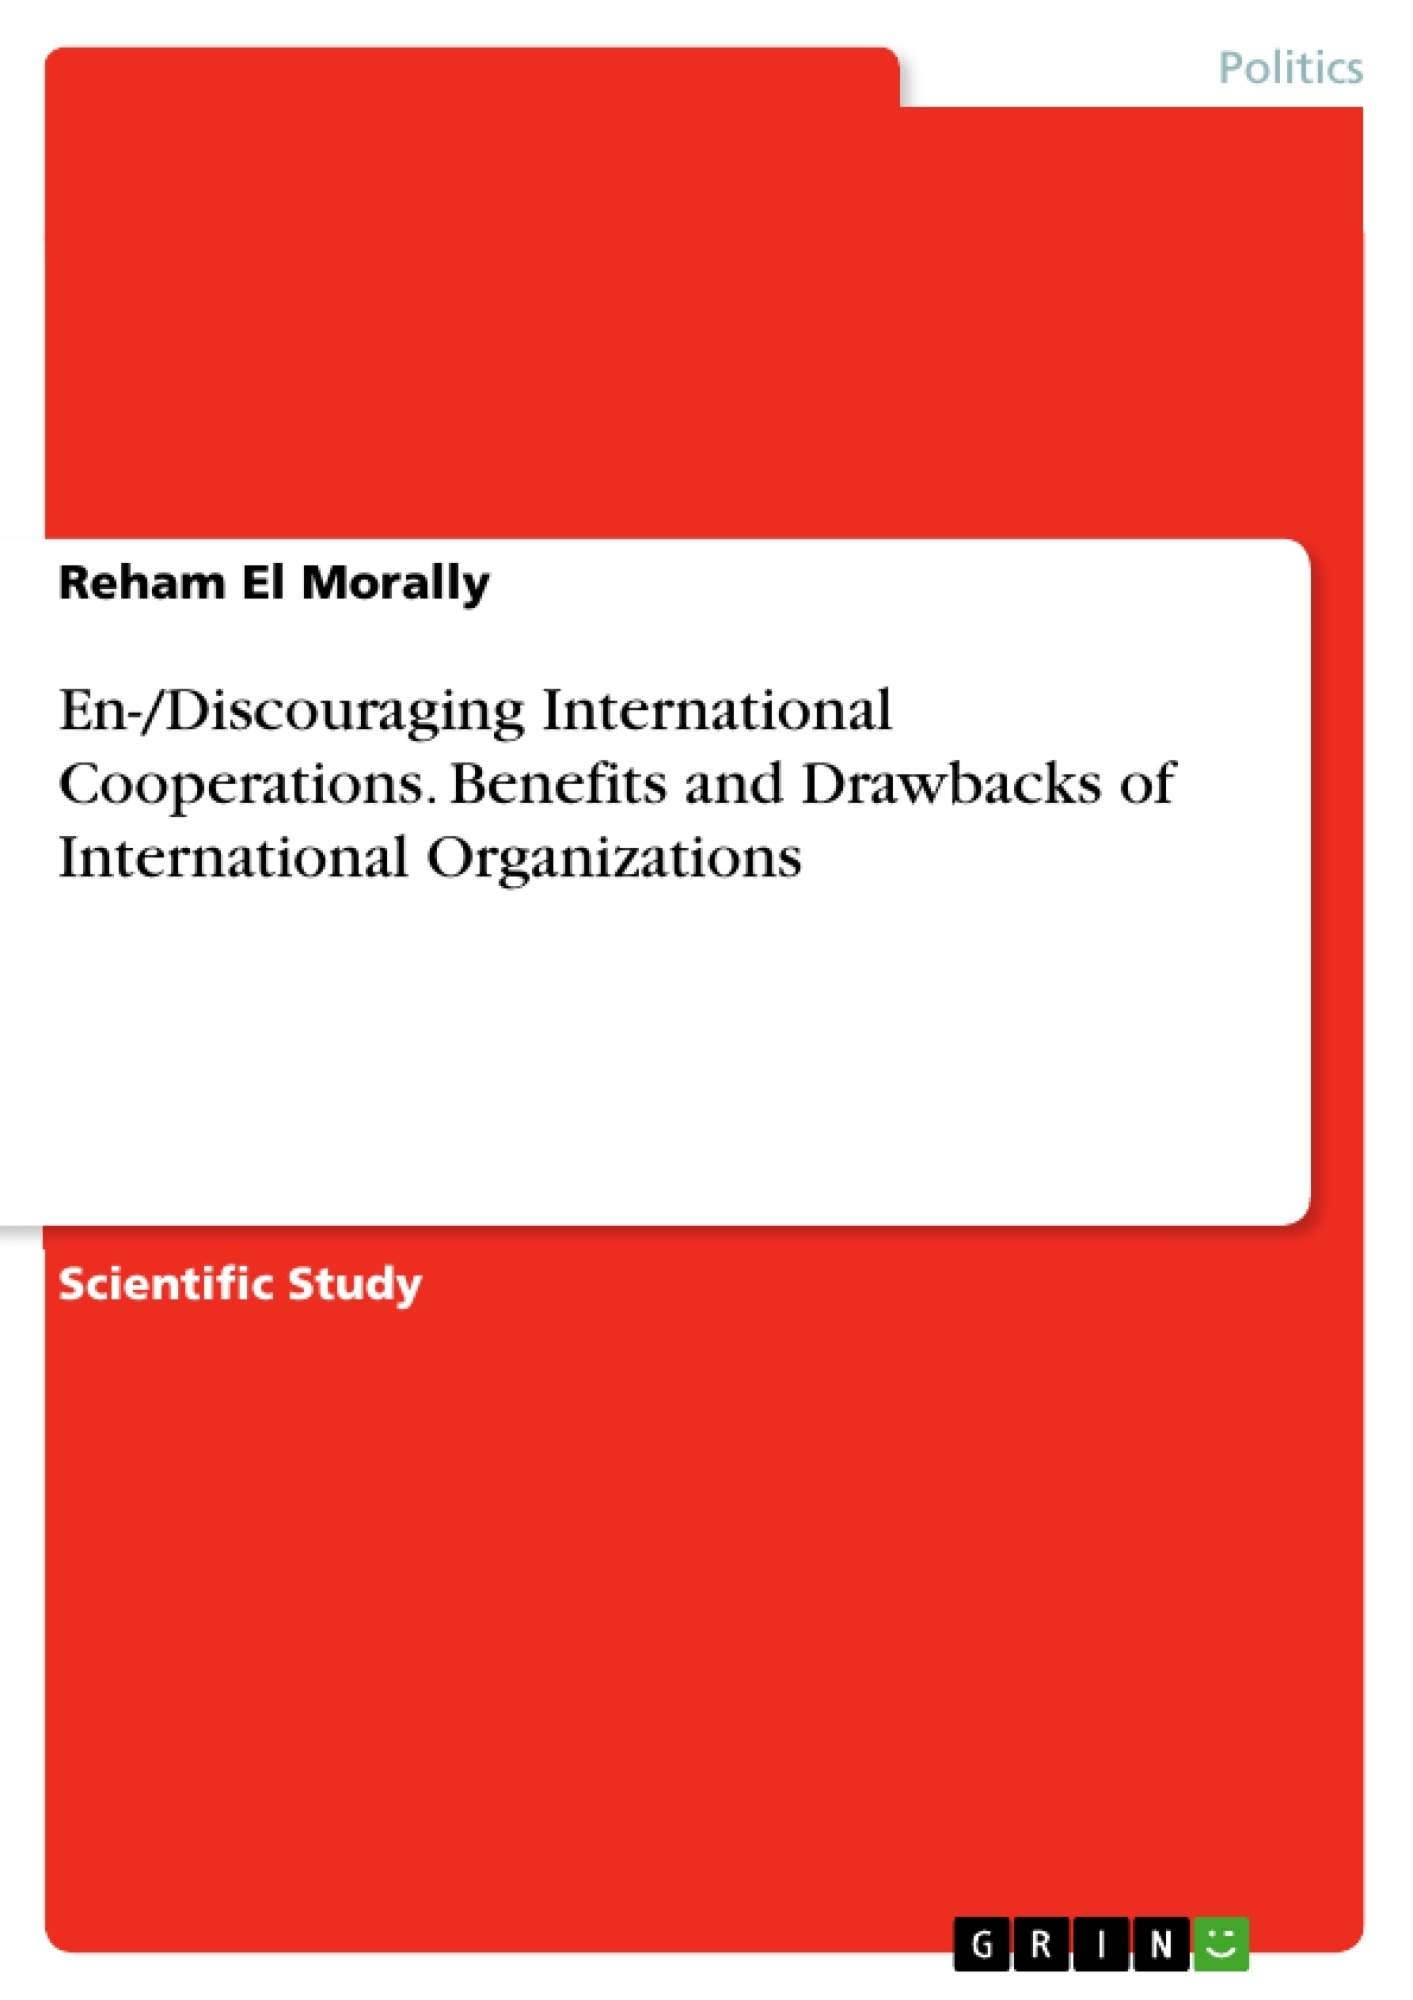 Title: En-/Discouraging International Cooperations. Benefits and Drawbacks of International Organizations